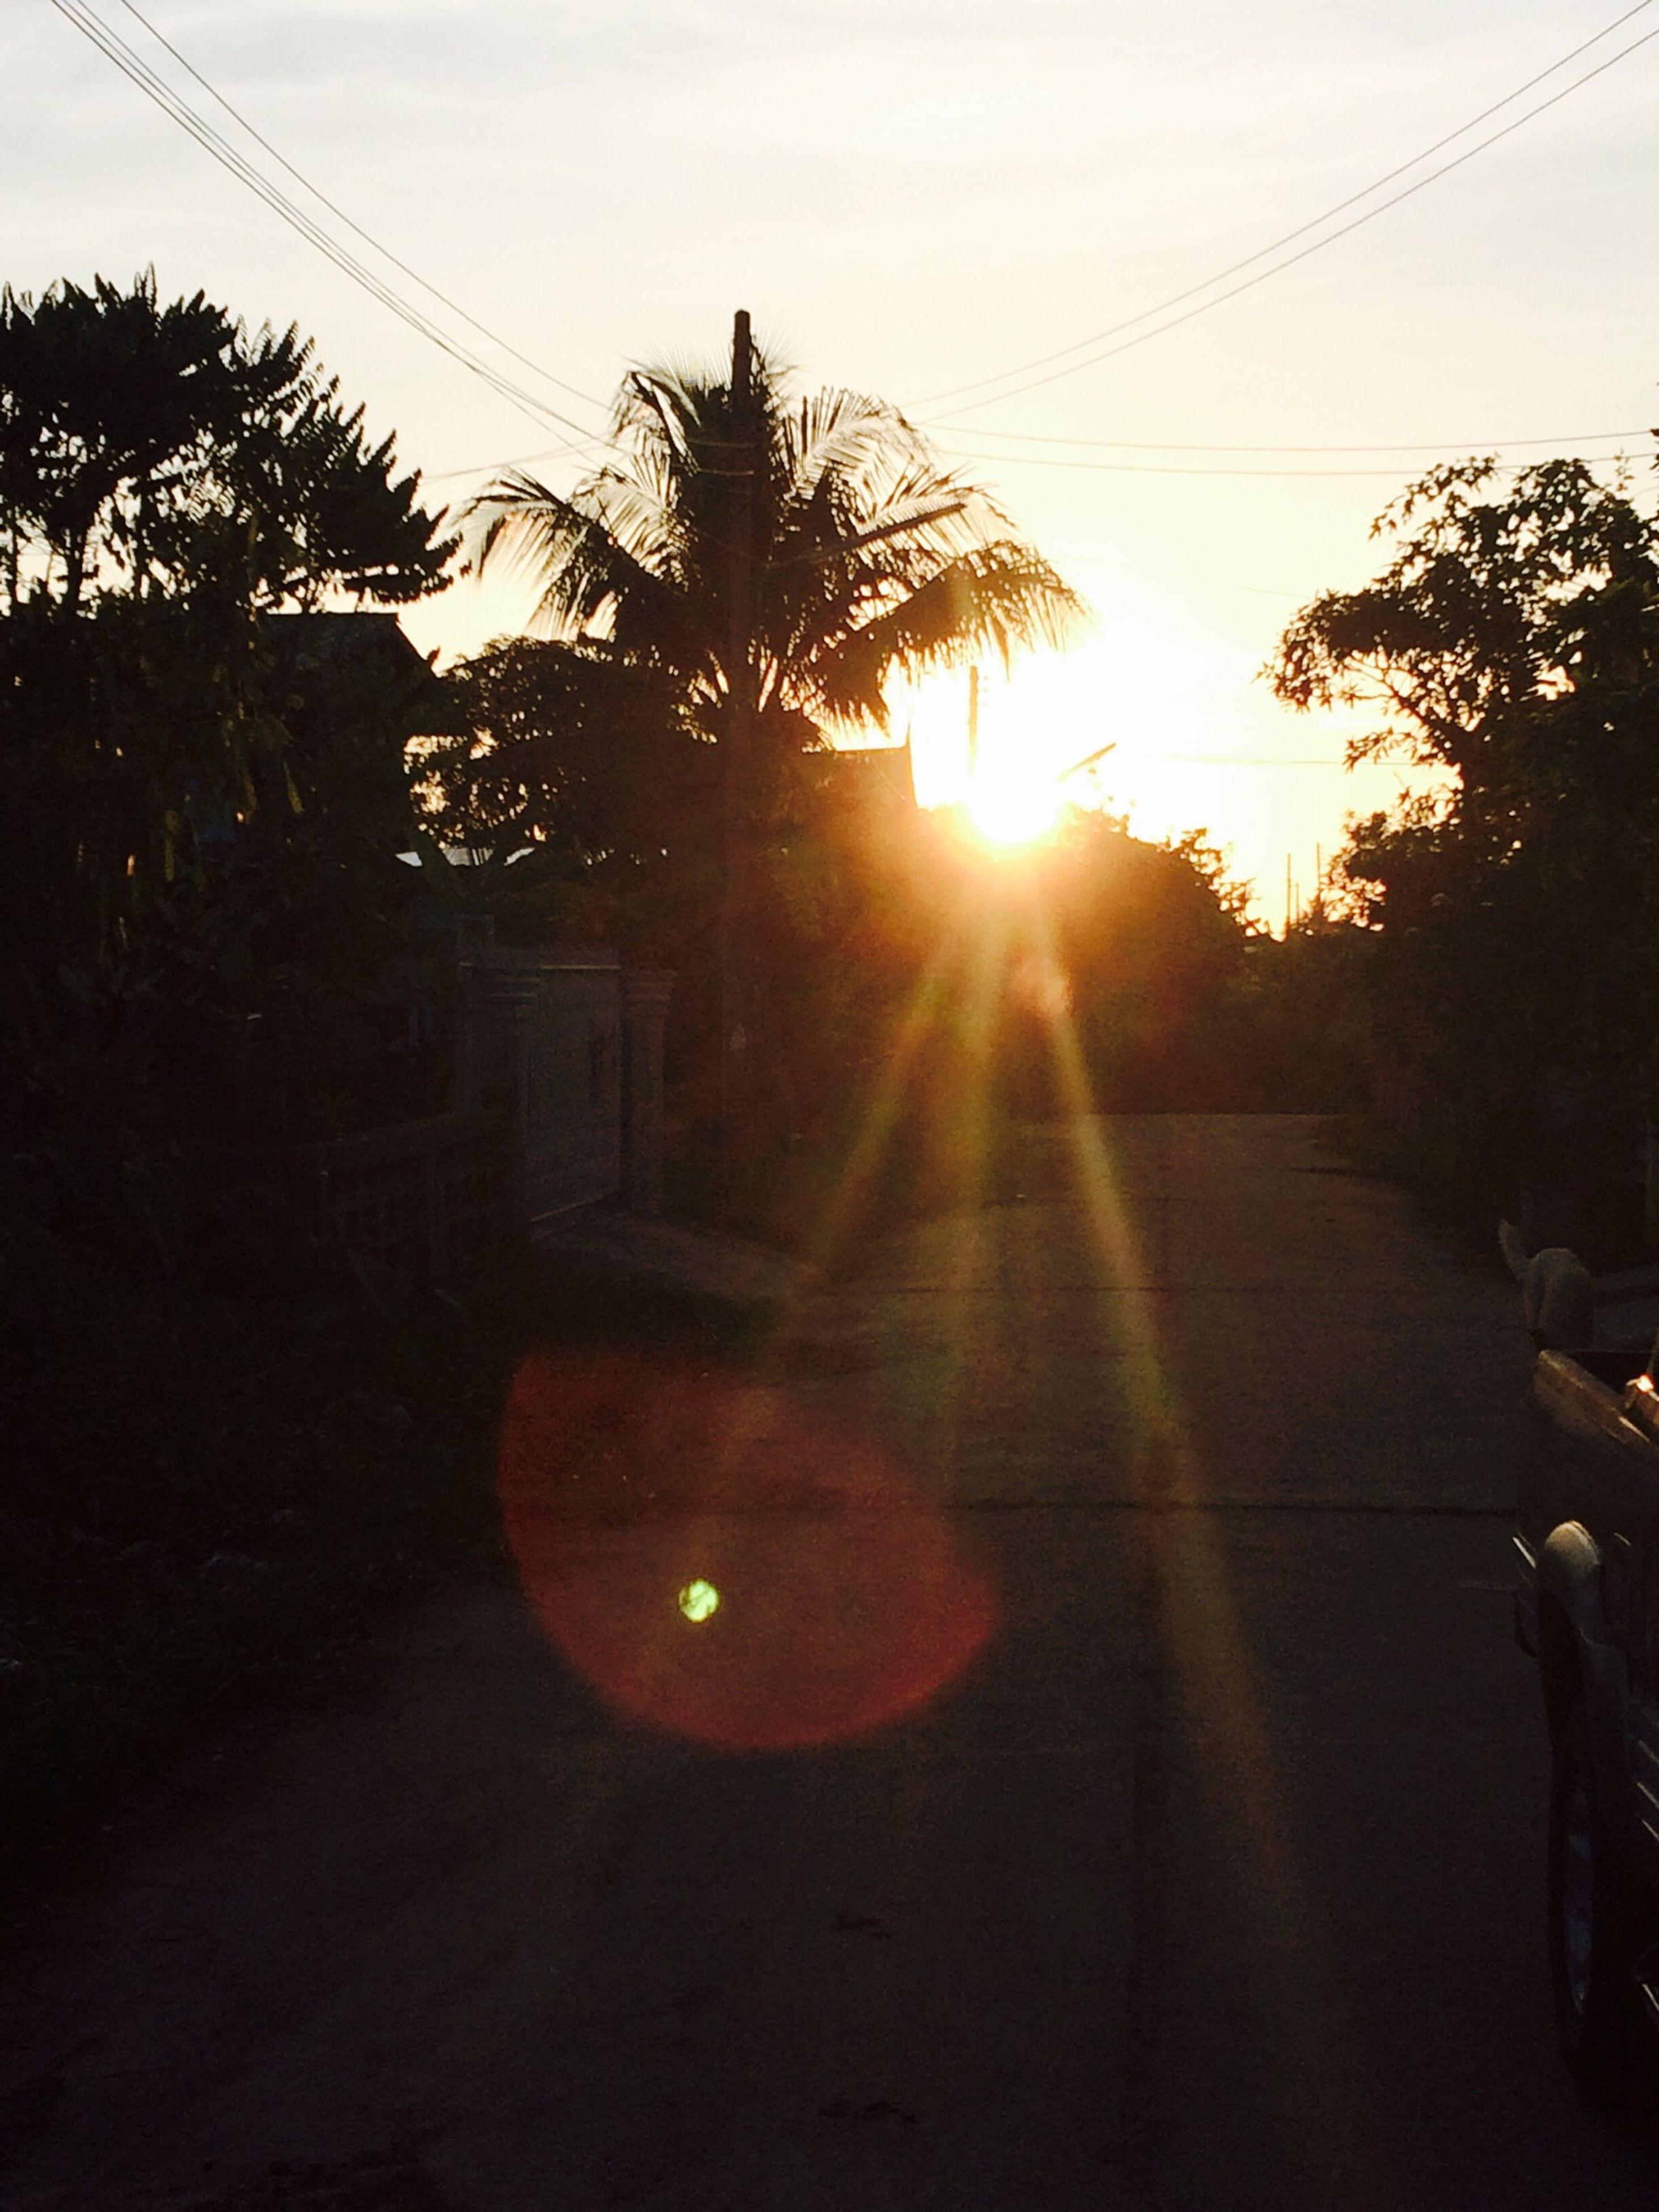 sun, sunset, lens flare, sunlight, tree, sunbeam, silhouette, transportation, sky, road, street, car, no people, clear sky, land vehicle, nature, shadow, outdoors, sunny, back lit